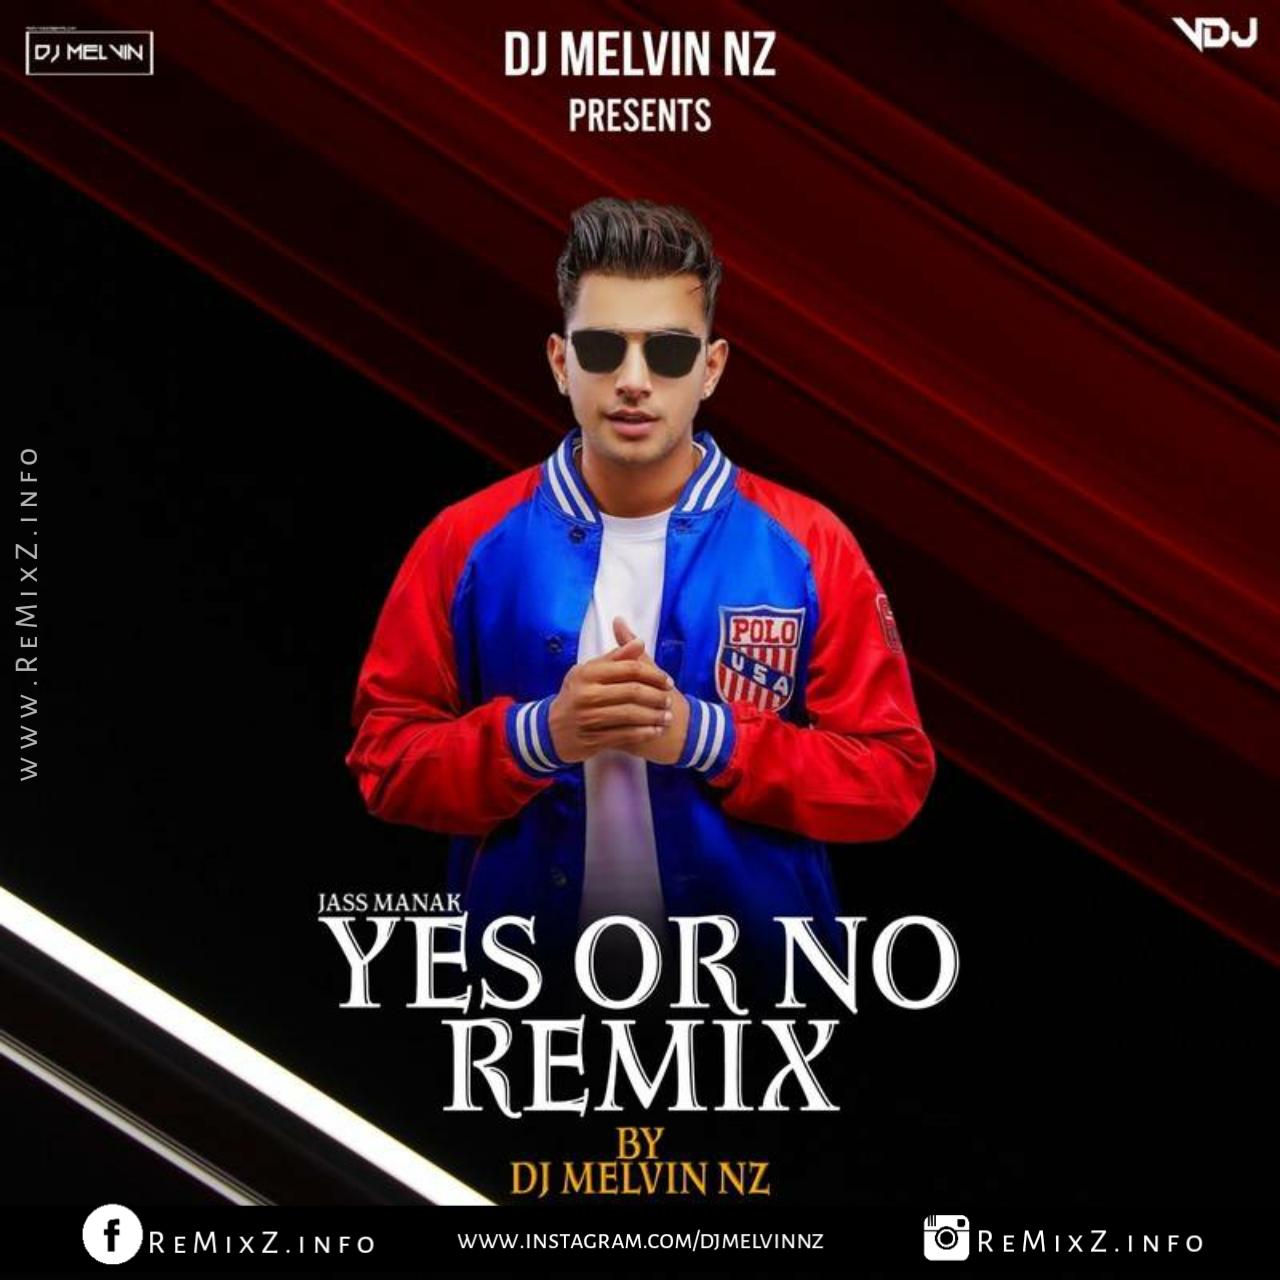 yes-or-no-remix-dj-melvin-nz.jpg